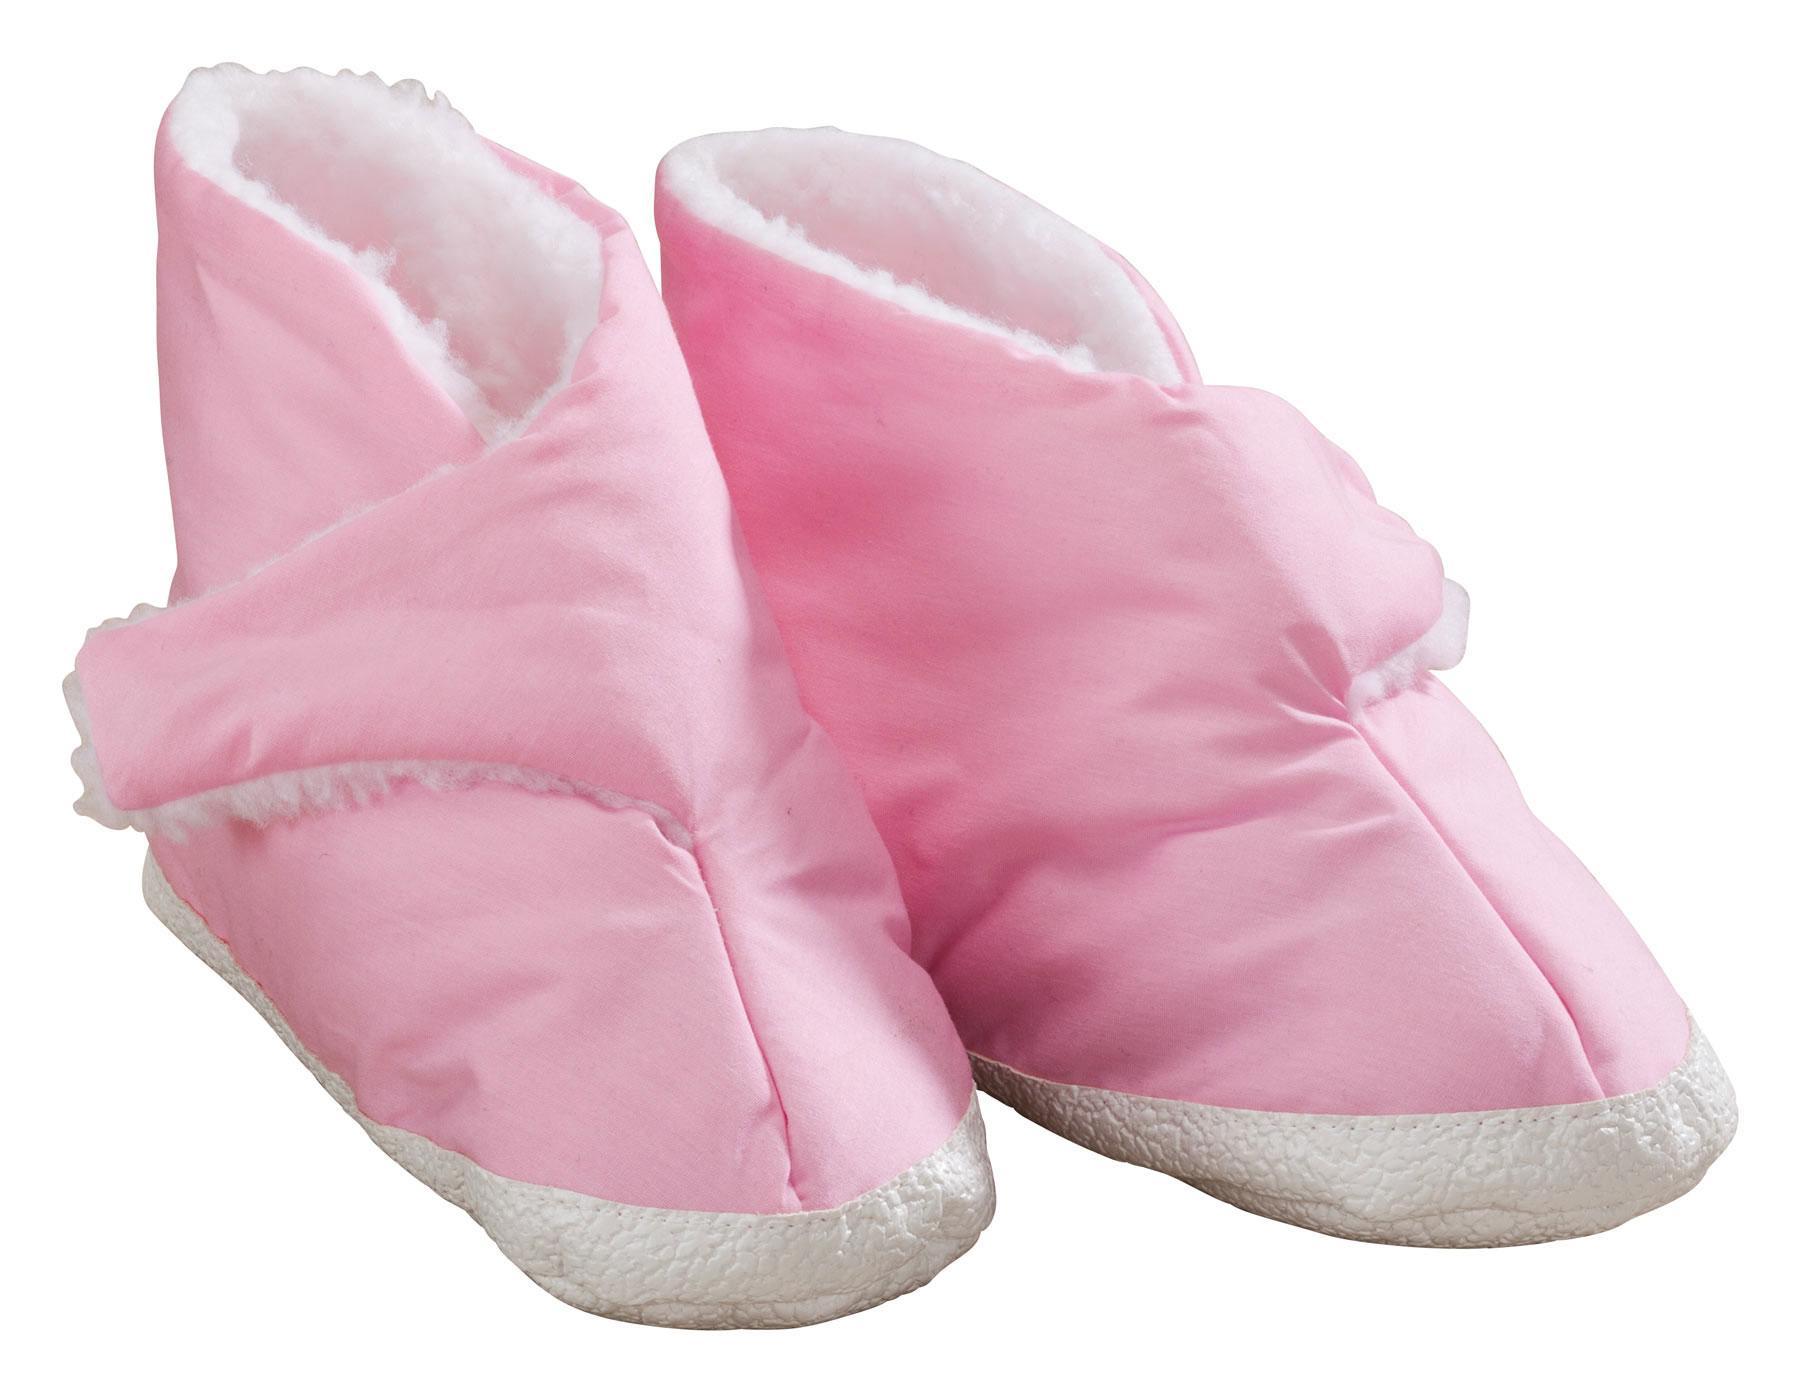 Slippers all new slippers for edema women for Mens bedroom slippers size 14